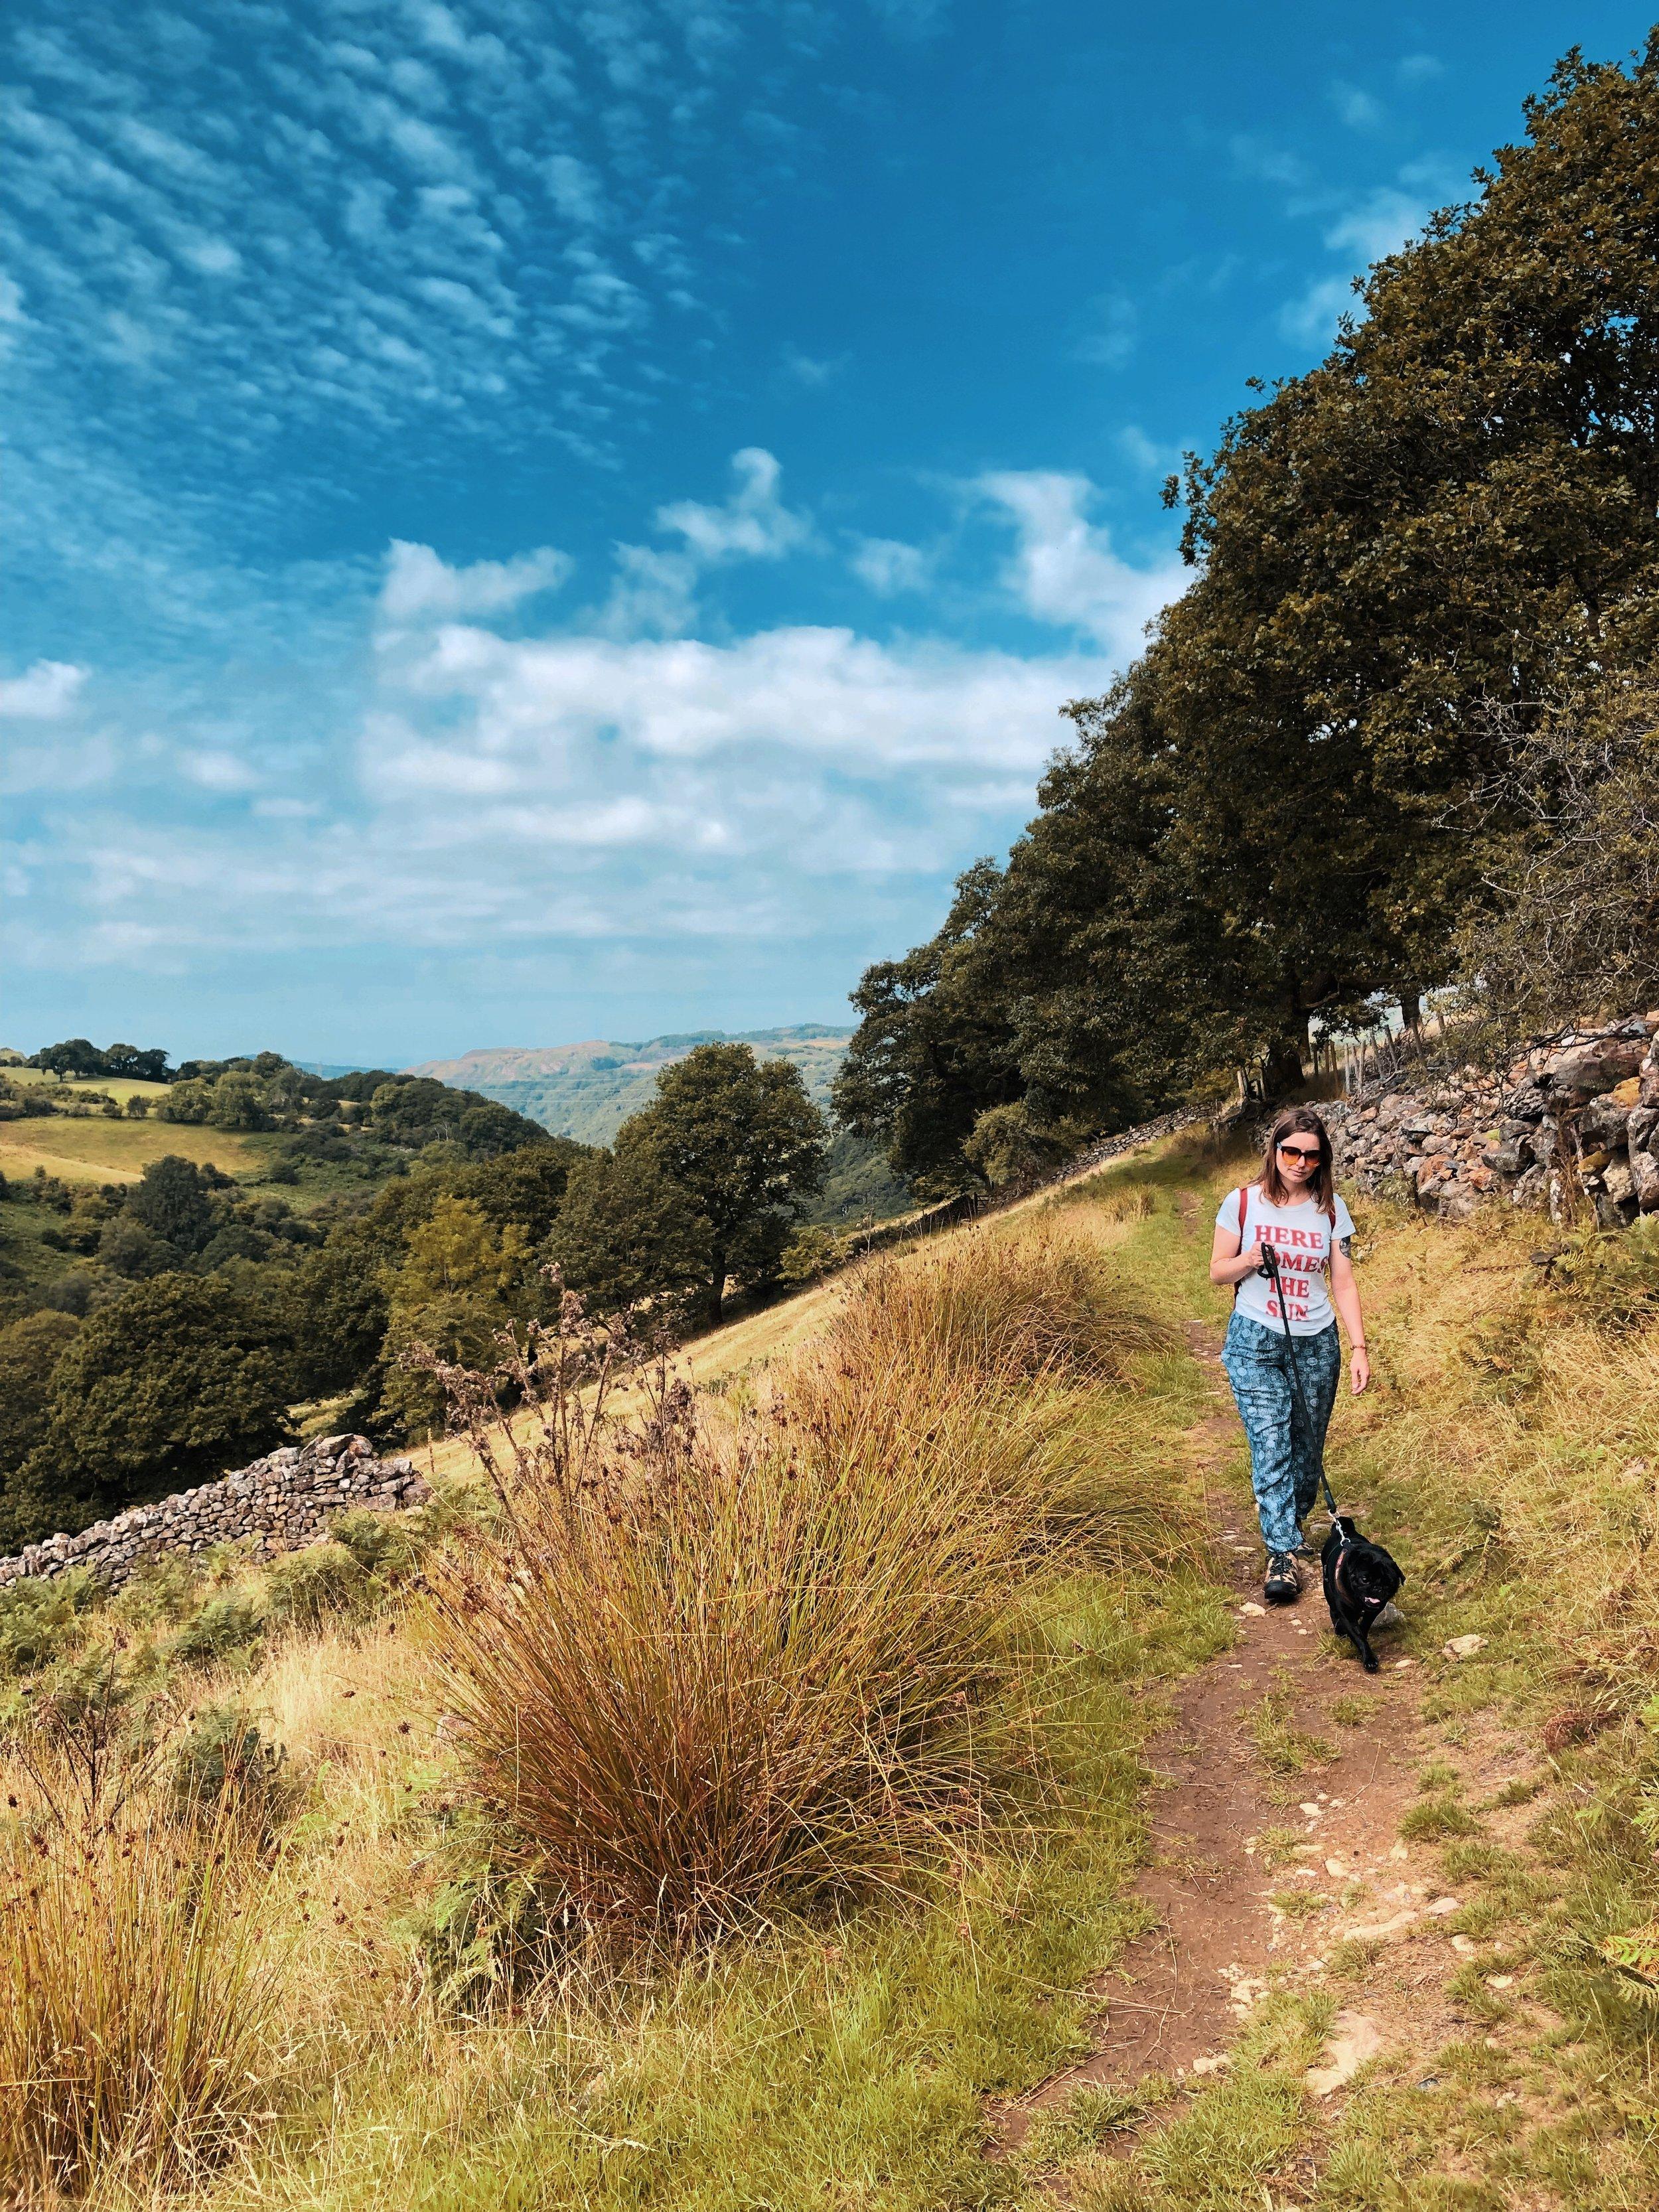 Walking through farmlands towards the rushing Cynfall waters